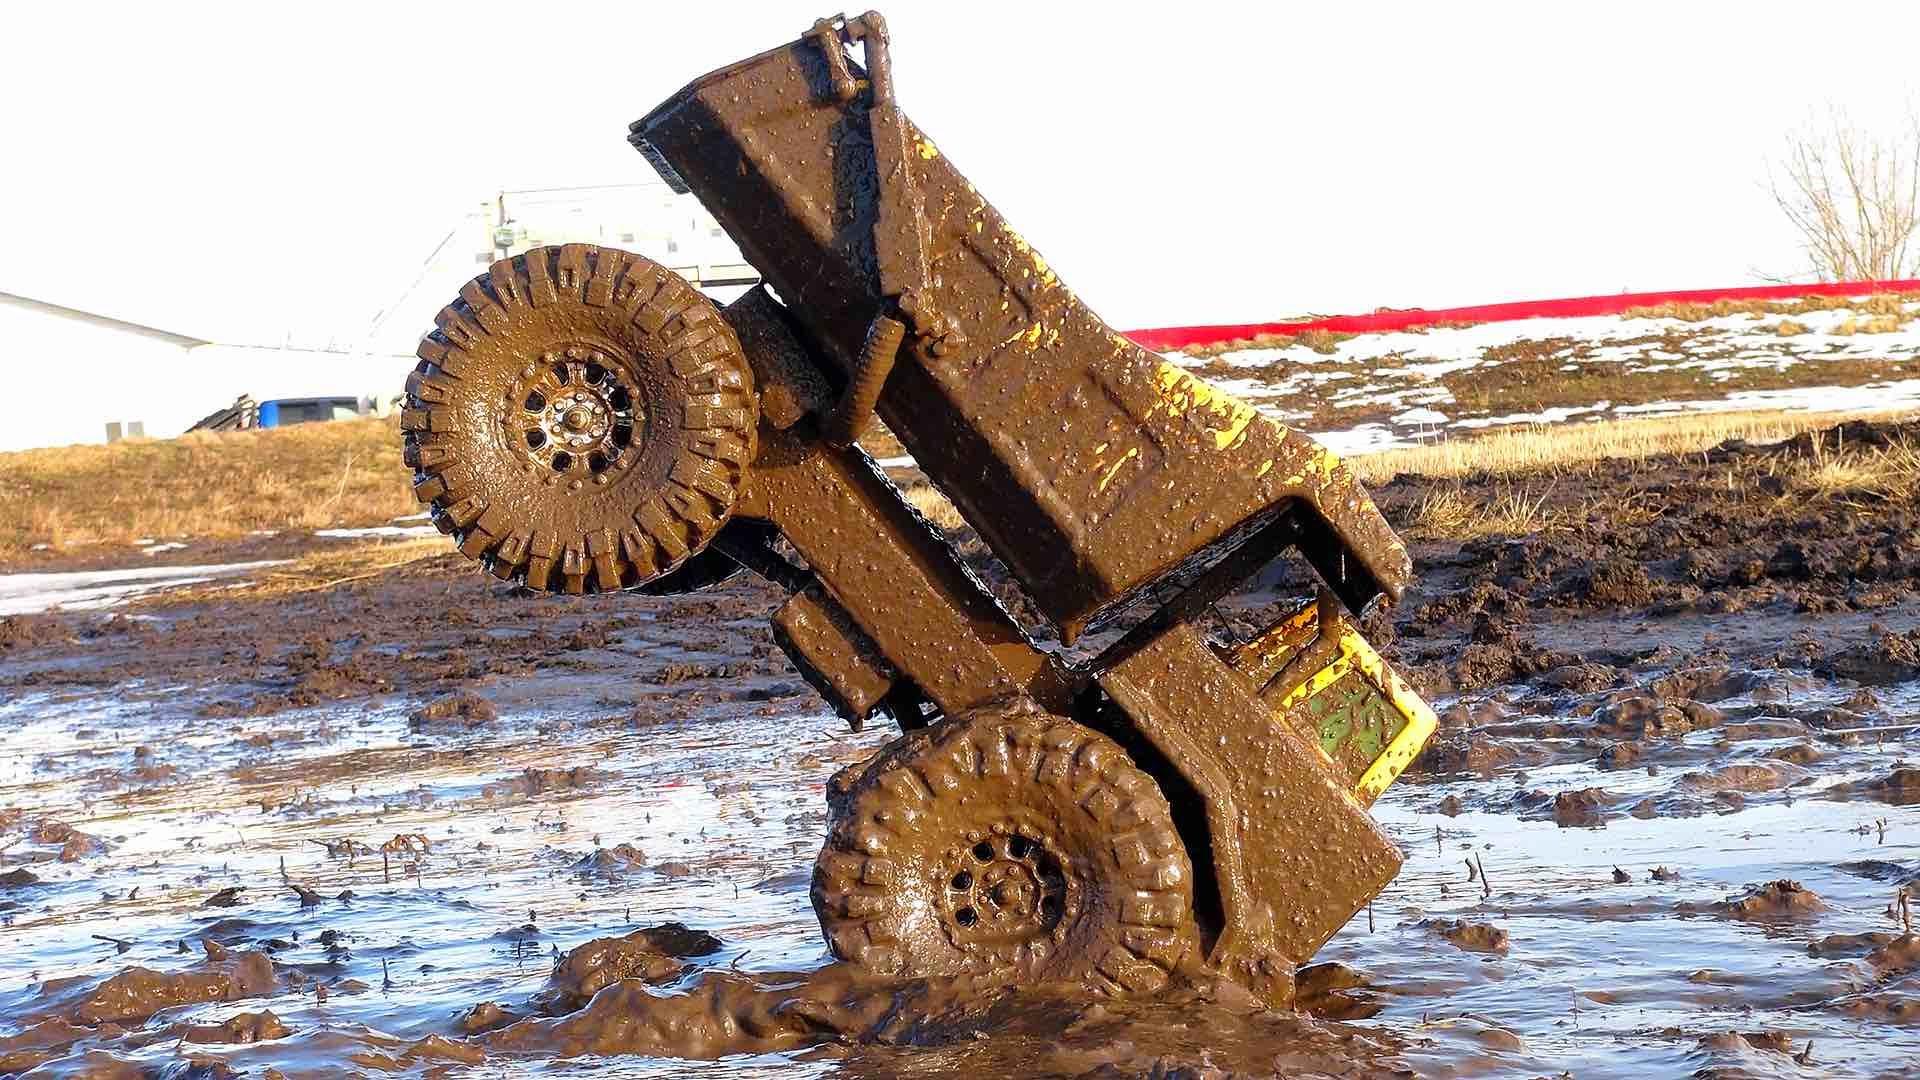 RC ADVENTURES - Mega Muddy Tonka Dump Truck Stomping Grounds - YouTube